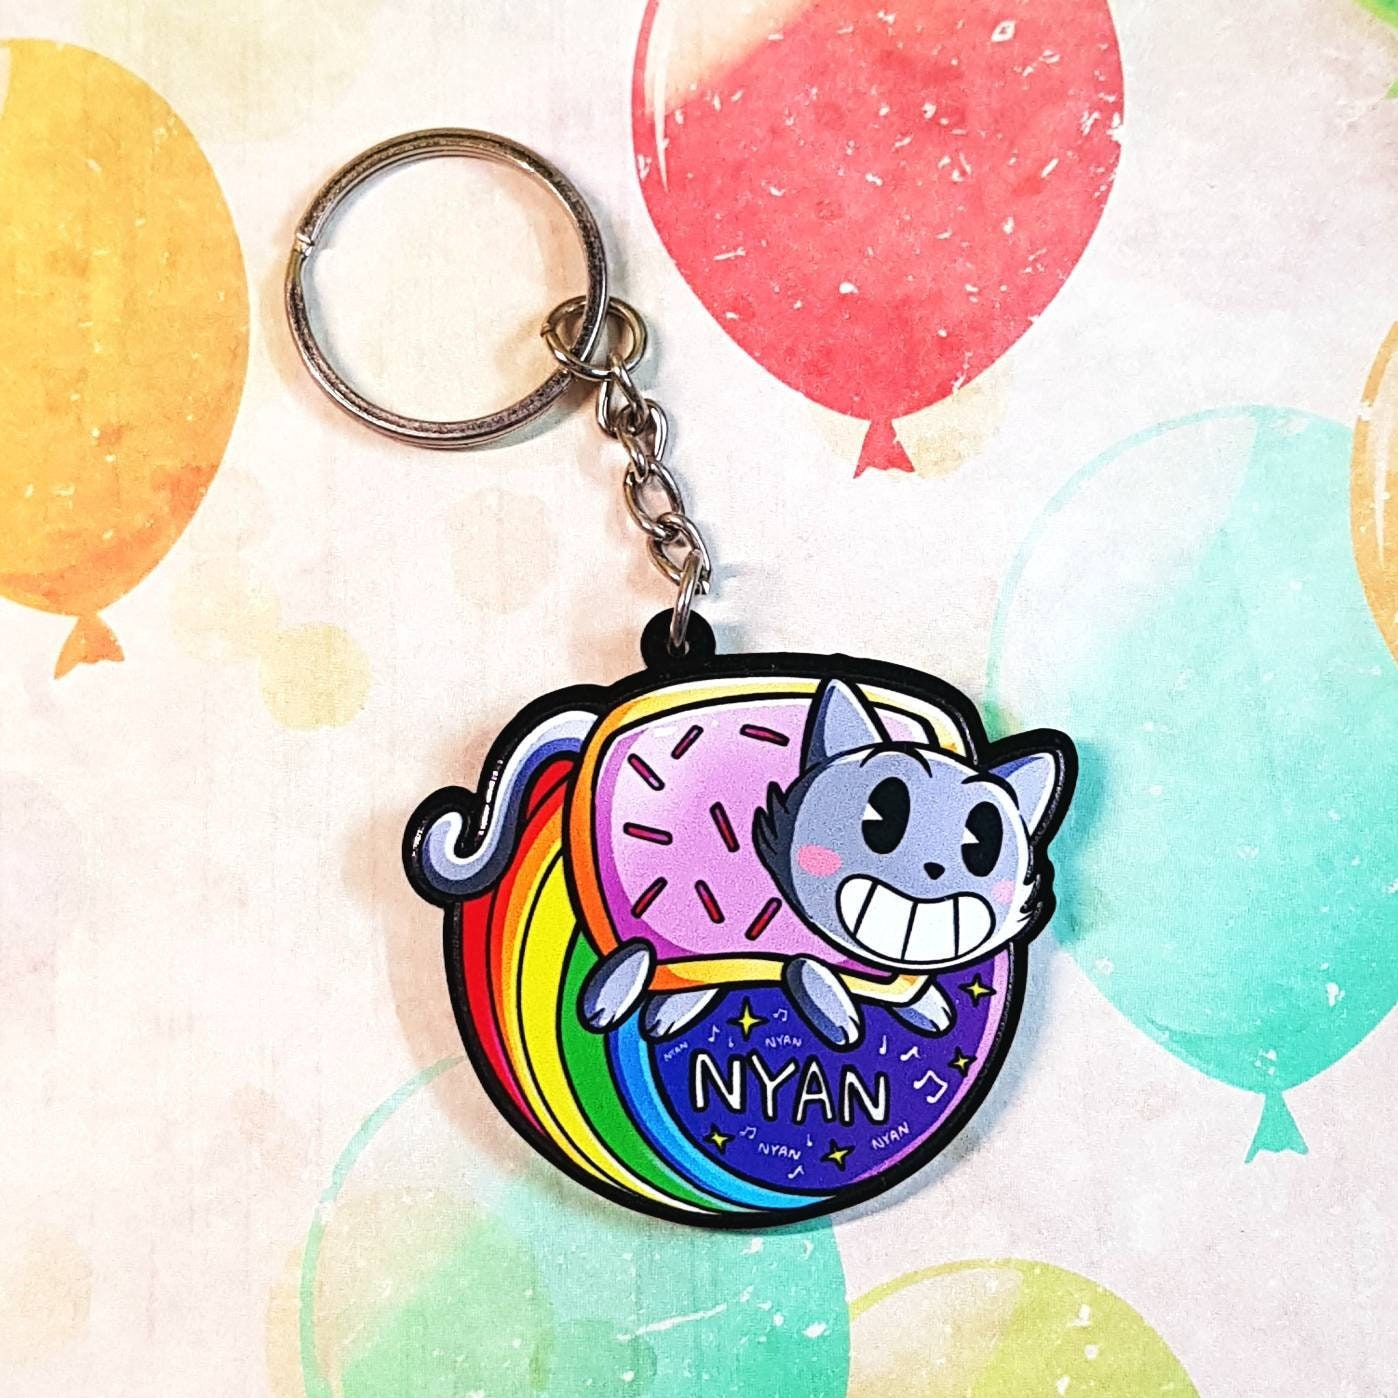 Nyan Cat Keychain, Internet Meme, Cartoon, Cat, Poptart, Funny, Cute,  Kawaii, Screwball, 1930s Cartoon, Inspired